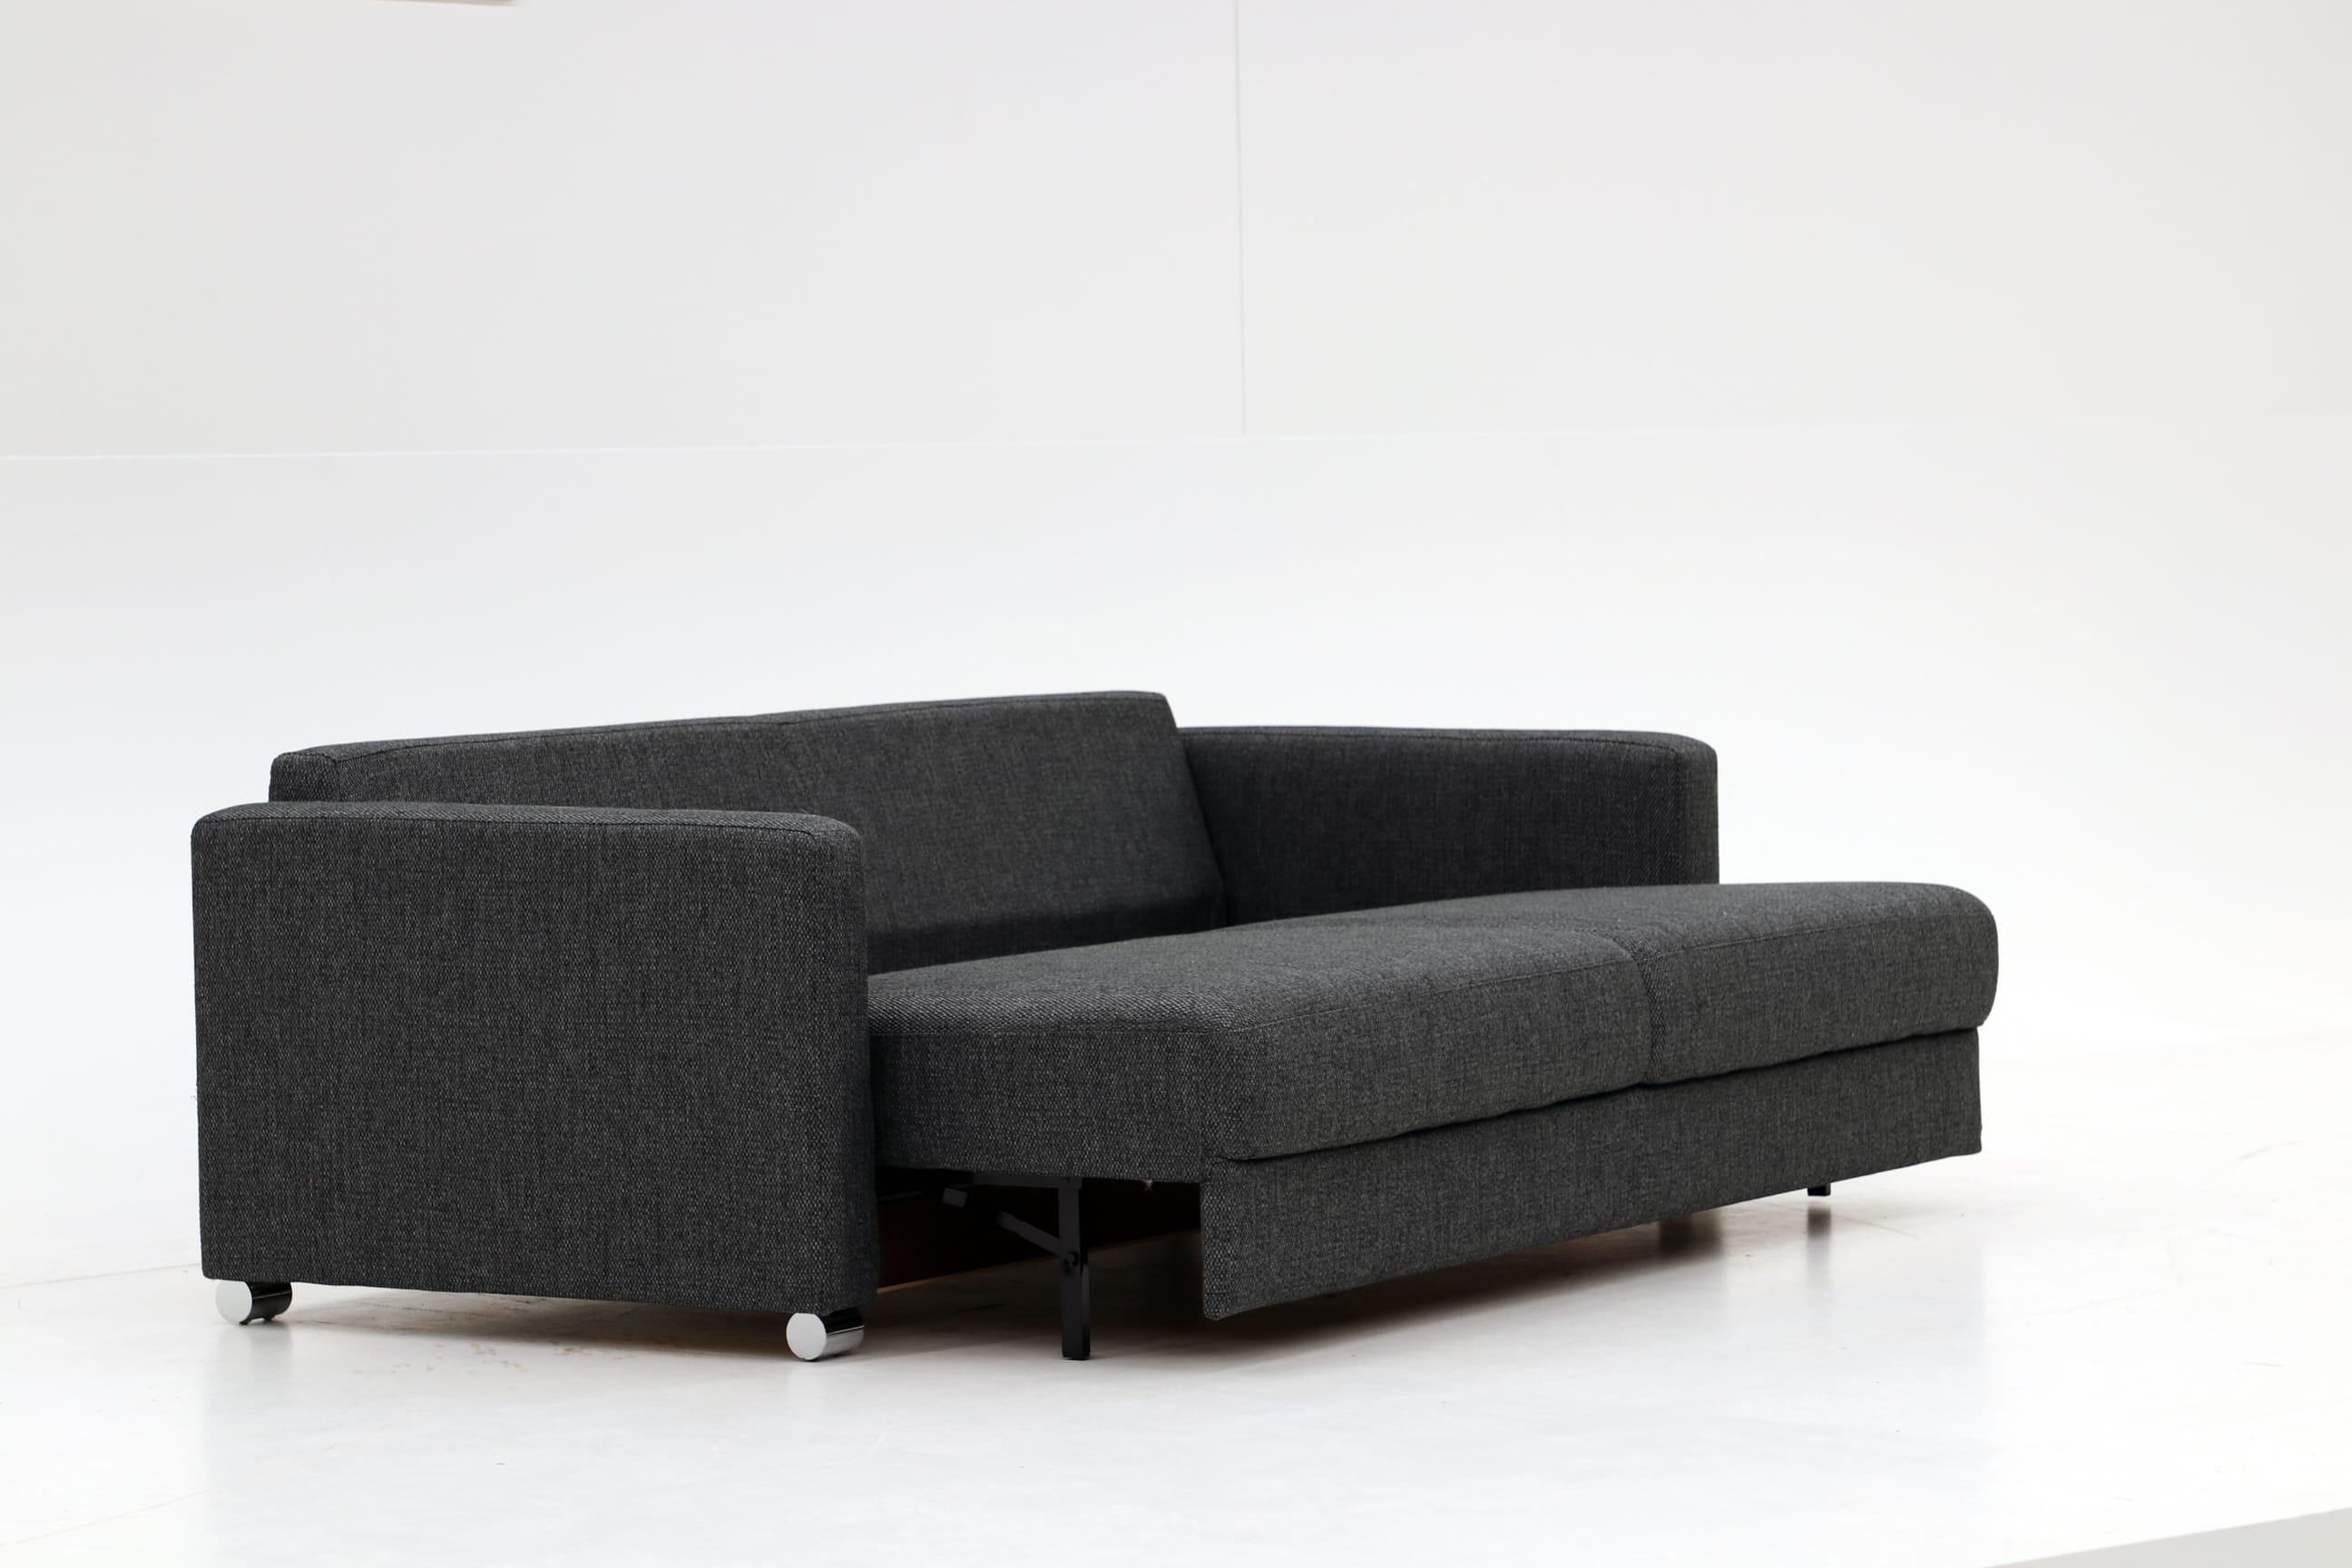 Groovy Fantasy Sofa Sleeper Full Xl Size By Luonto Furniture Spiritservingveterans Wood Chair Design Ideas Spiritservingveteransorg